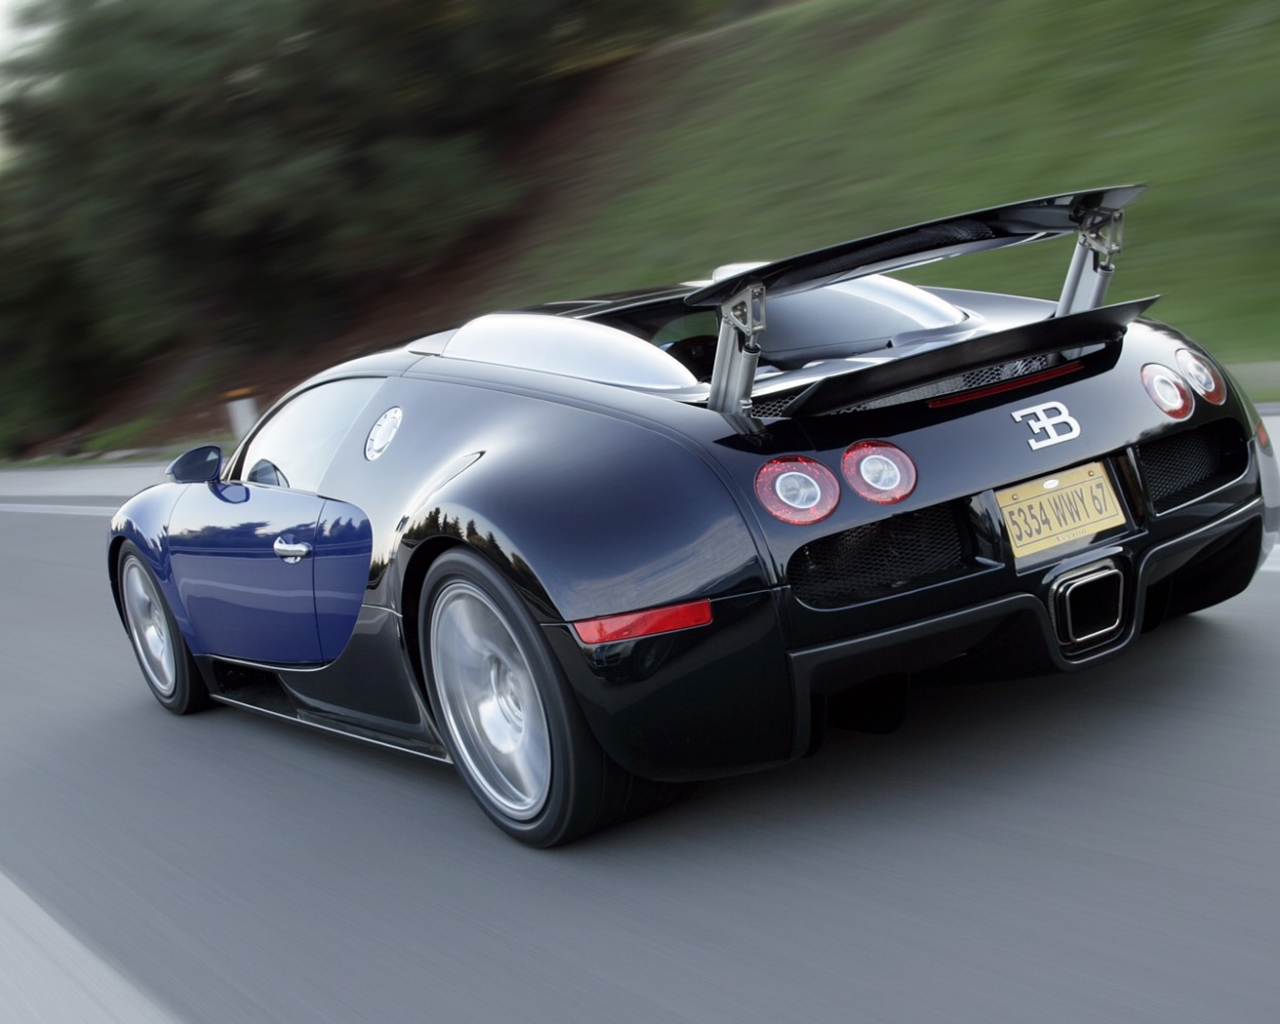 Bugatti Veyron en la carretera - 1280x1024